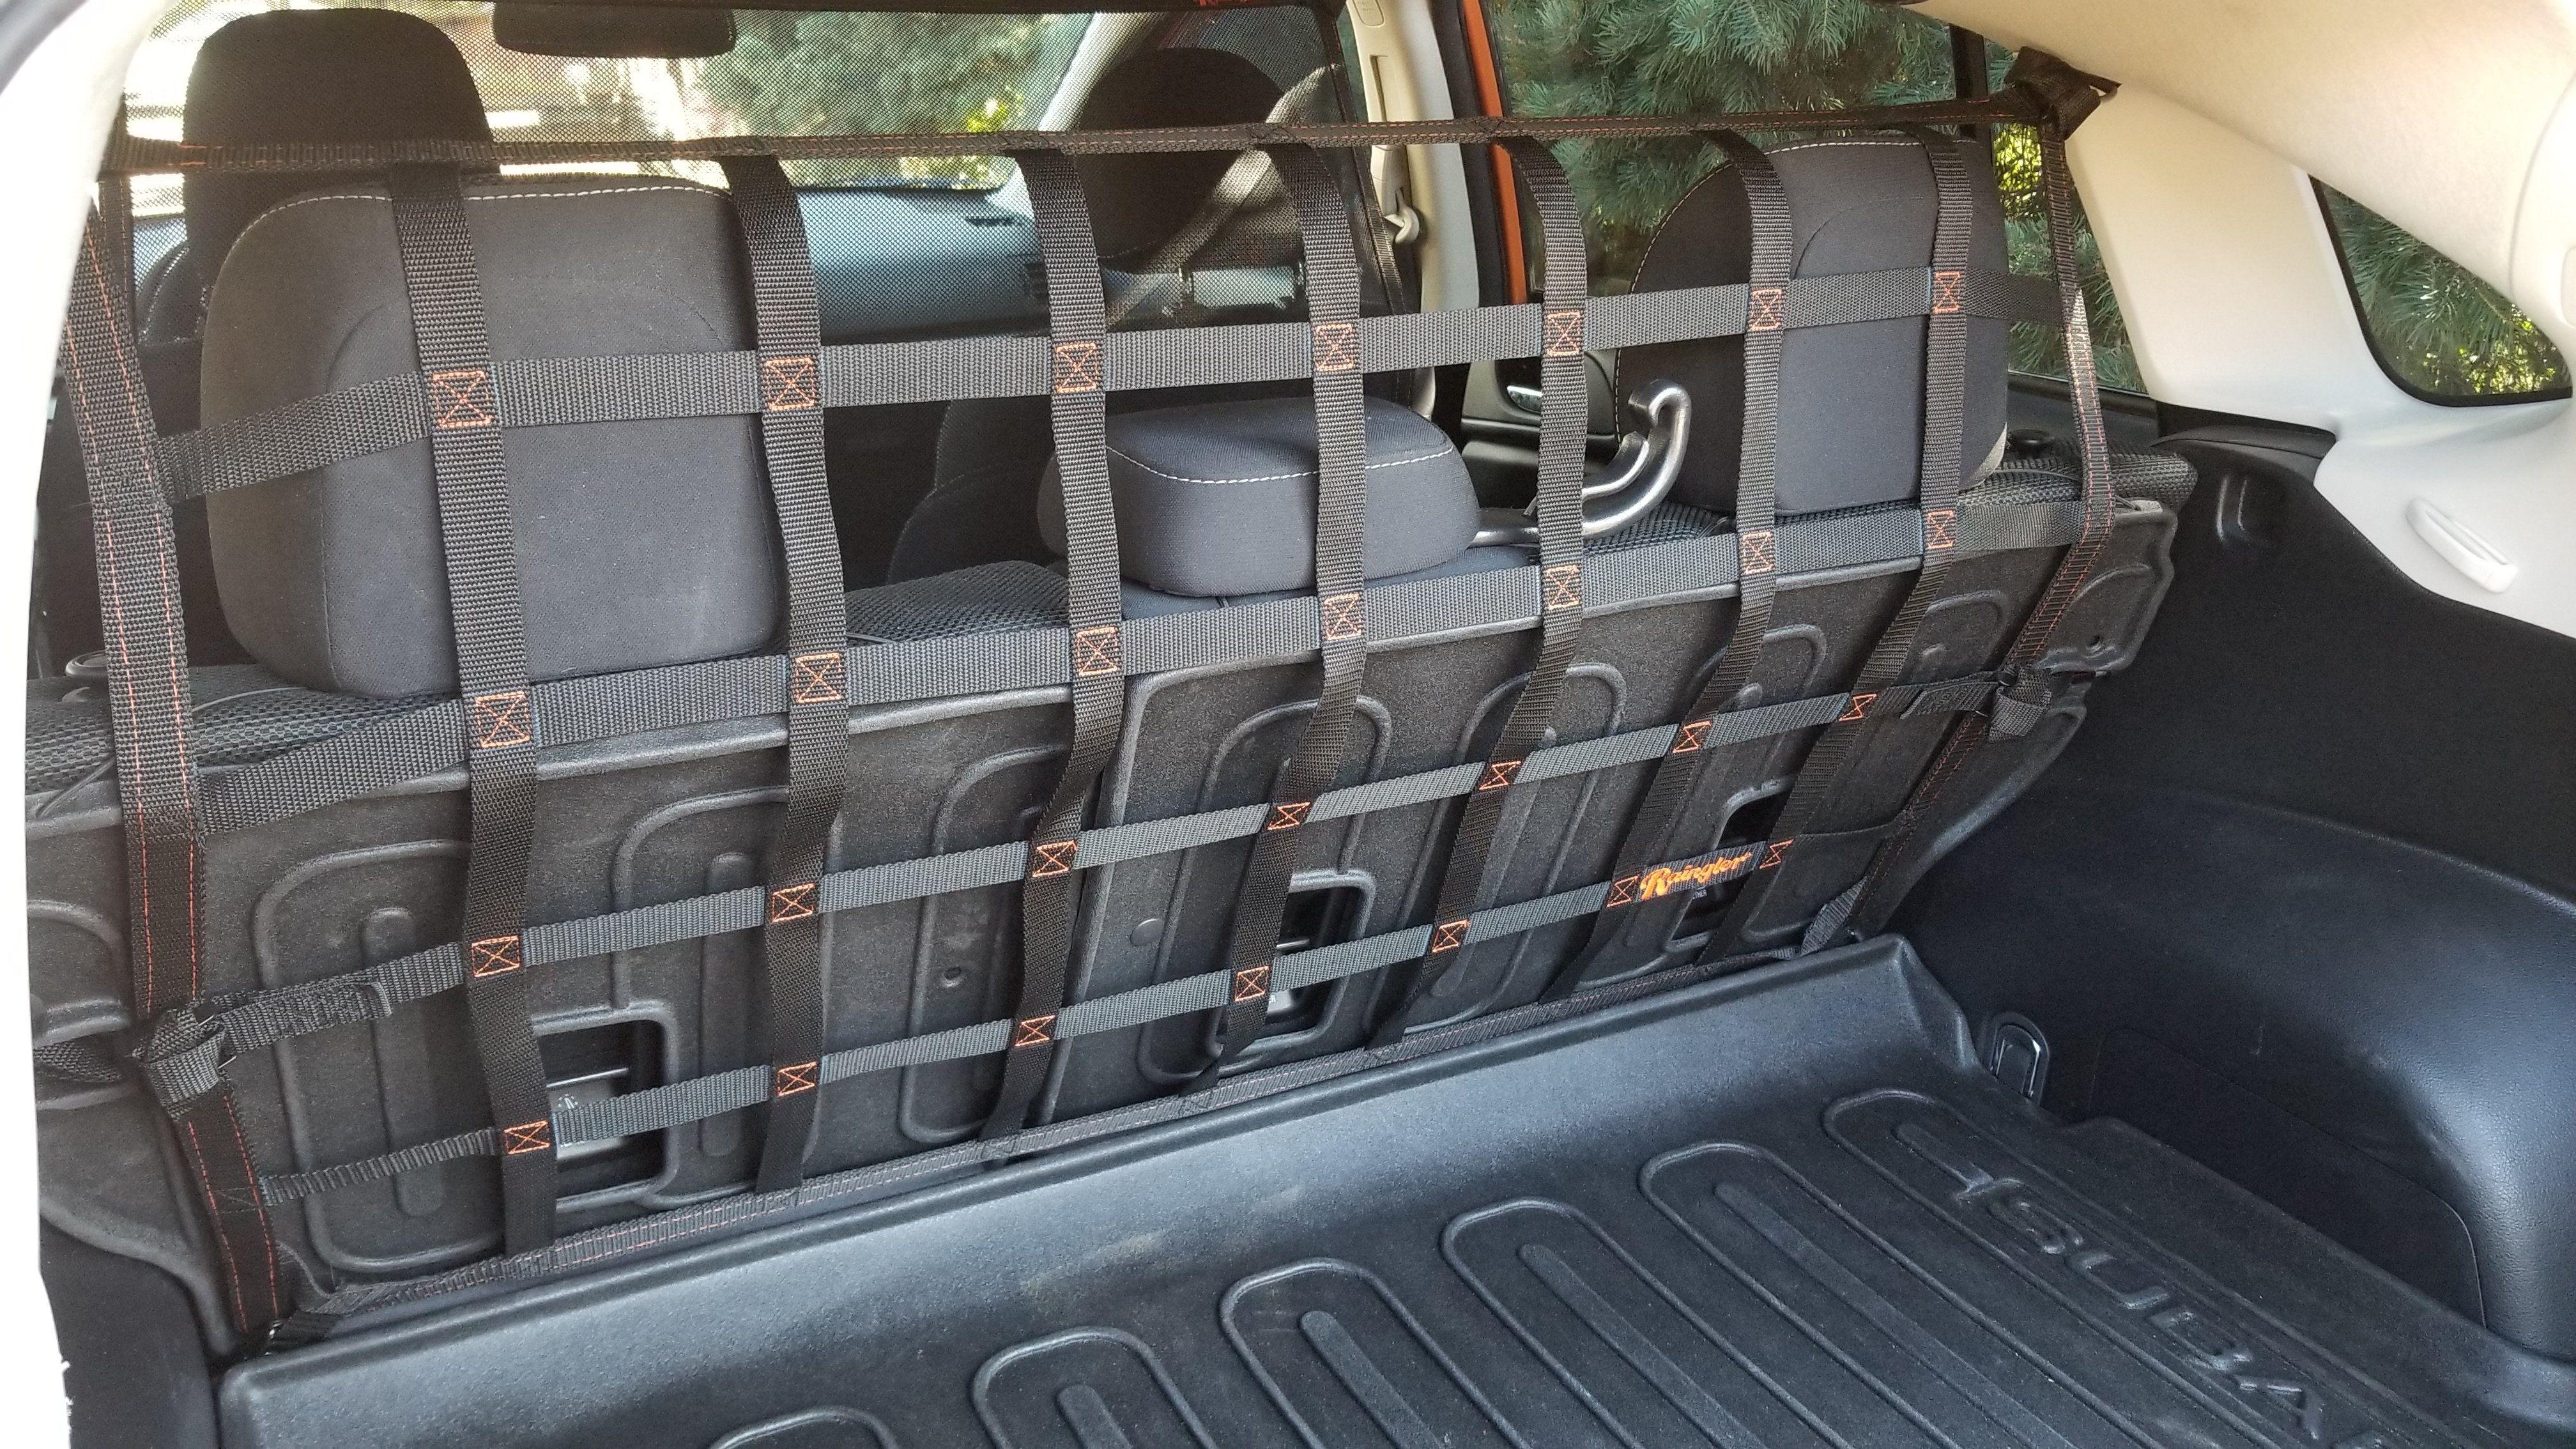 2011 newer Subaru Crosstrek XV Impreza behind rear seat barrier